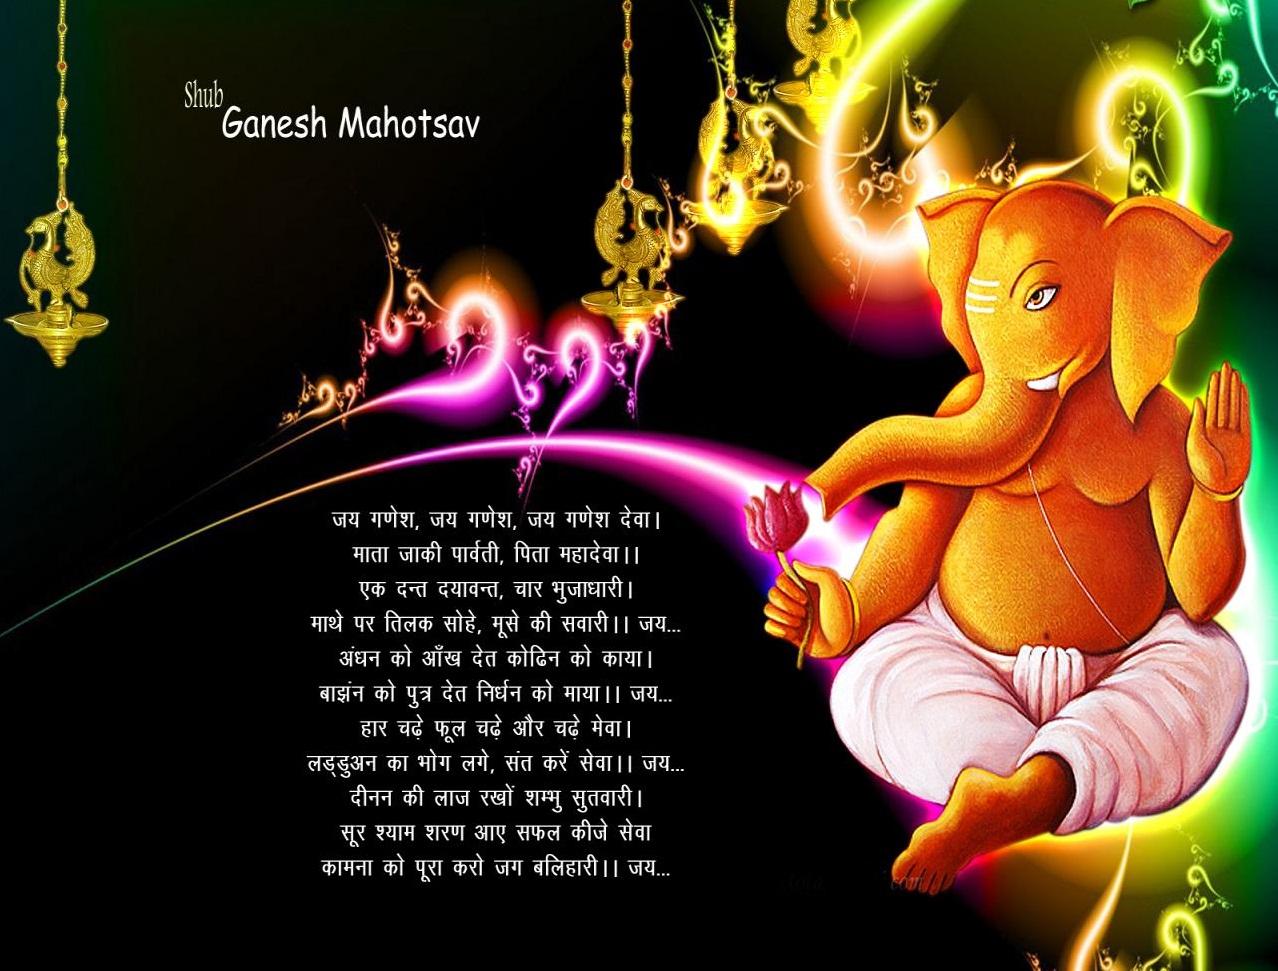 ganesh utsav essay in sanskrit